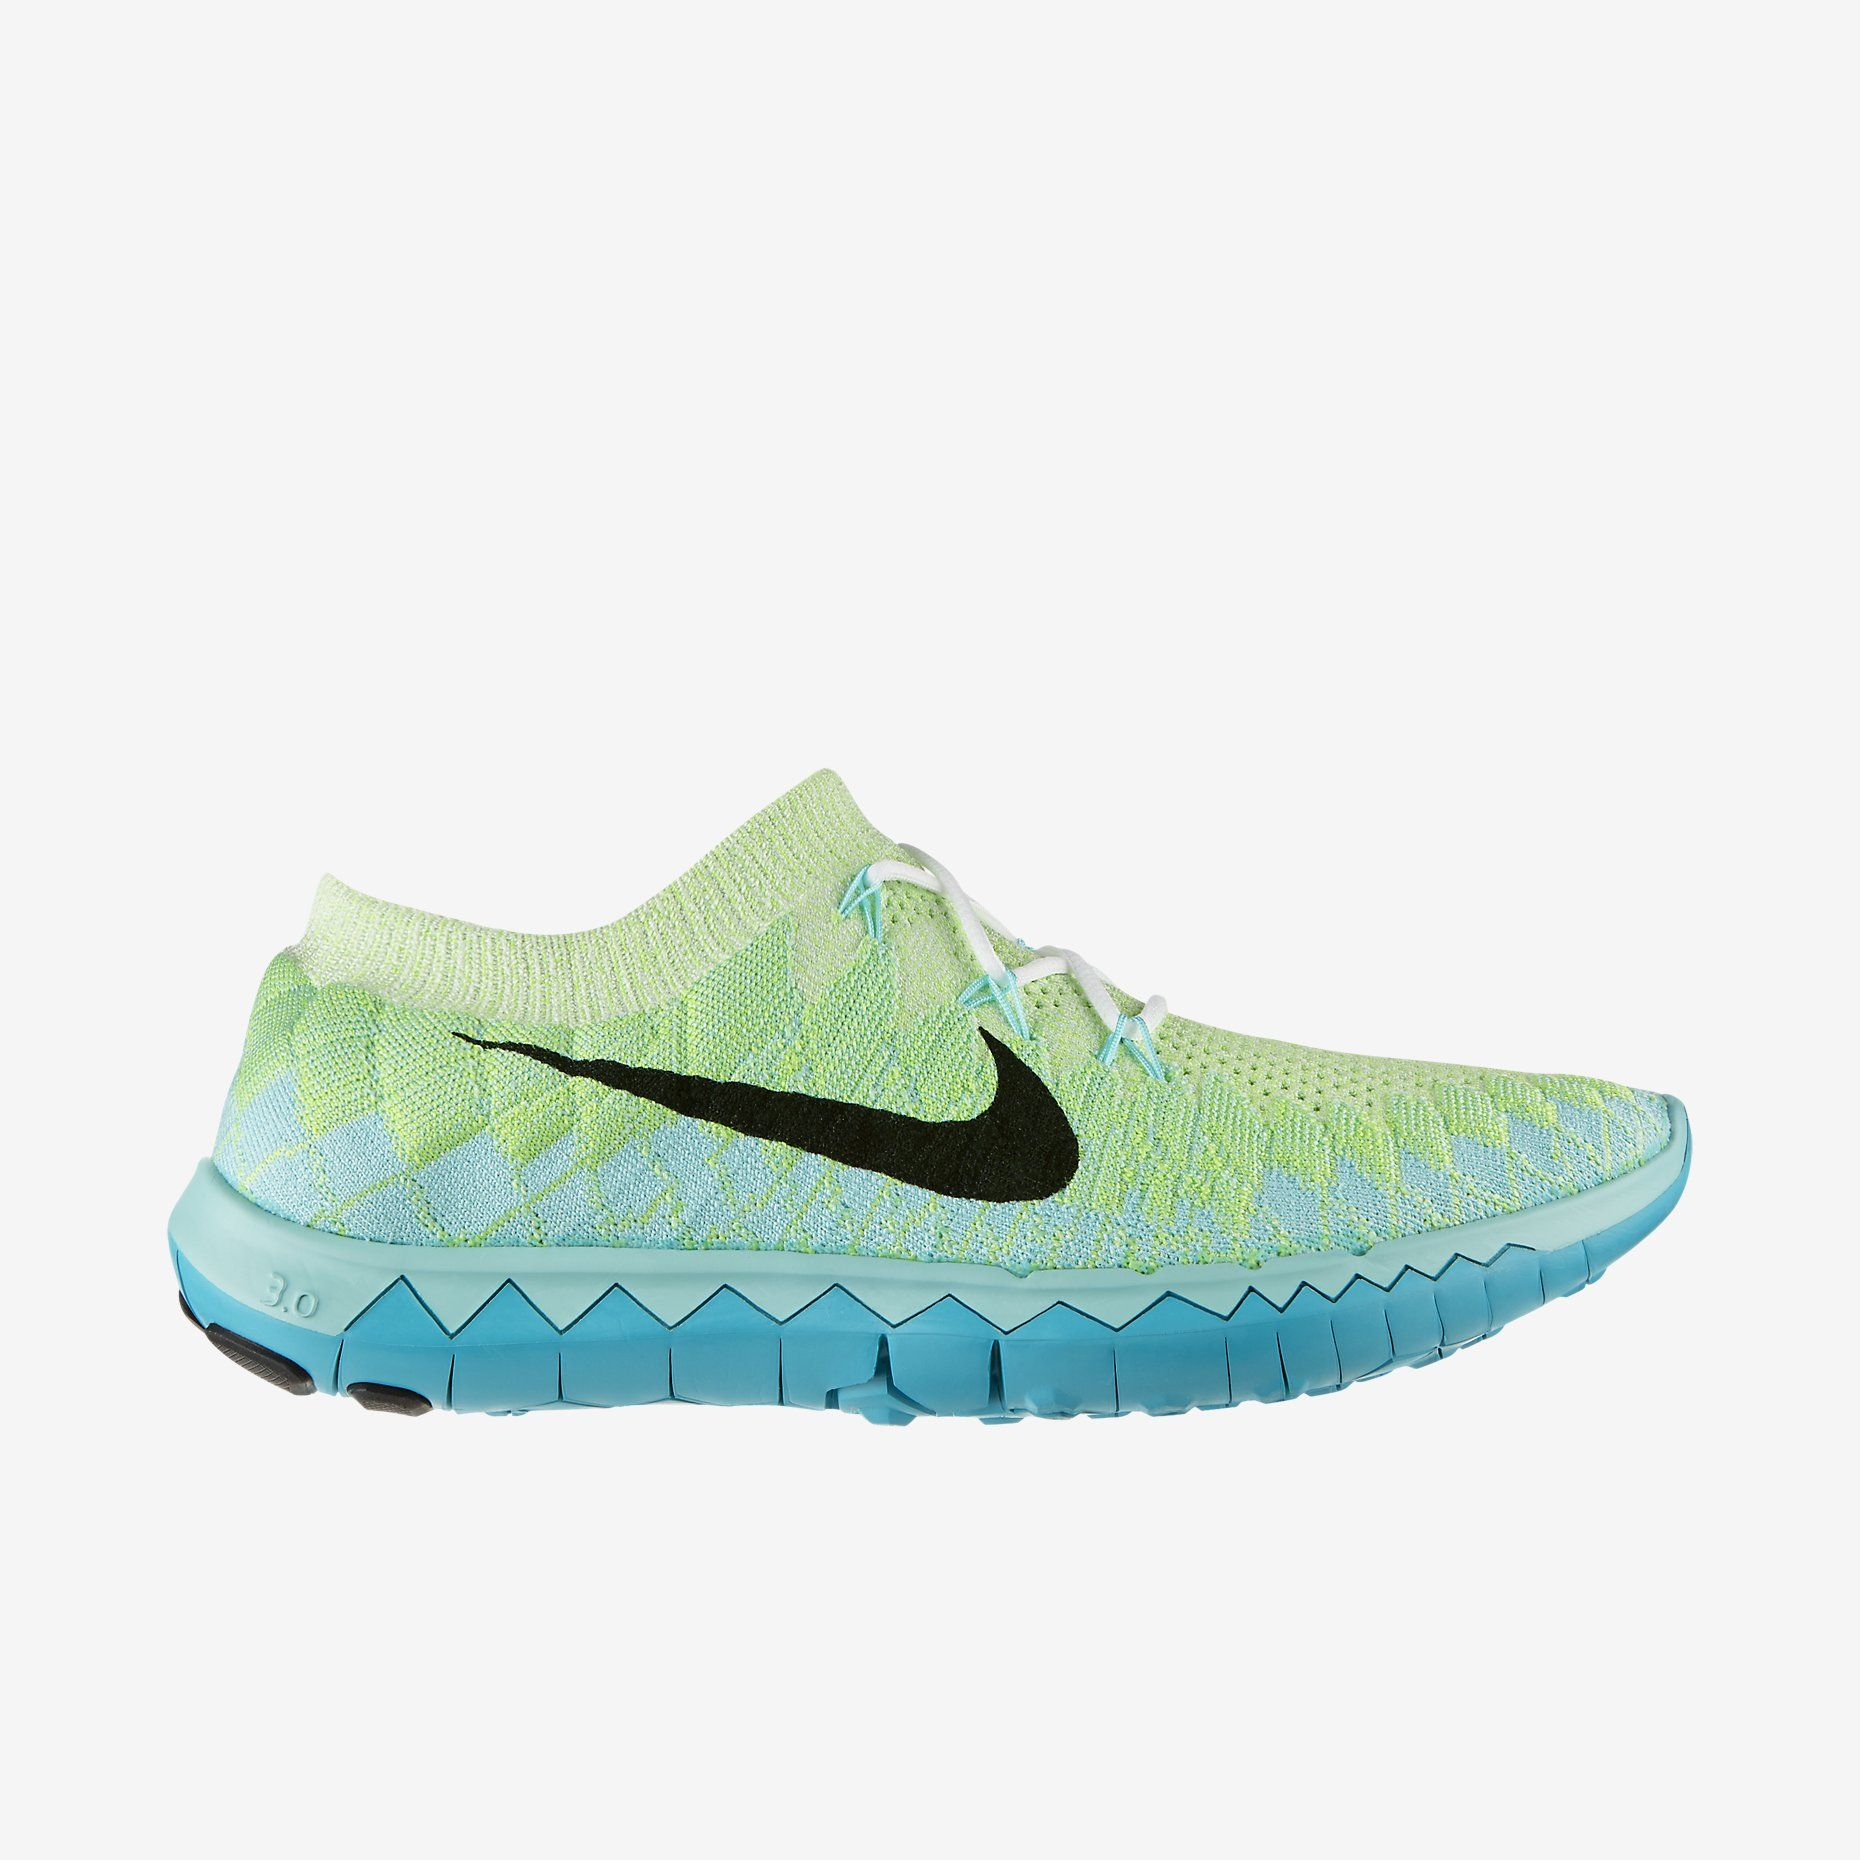 the best attitude 1c80e 91c50 Nike Free 3.0 Flyknit Women s Running Shoe. Nike Store